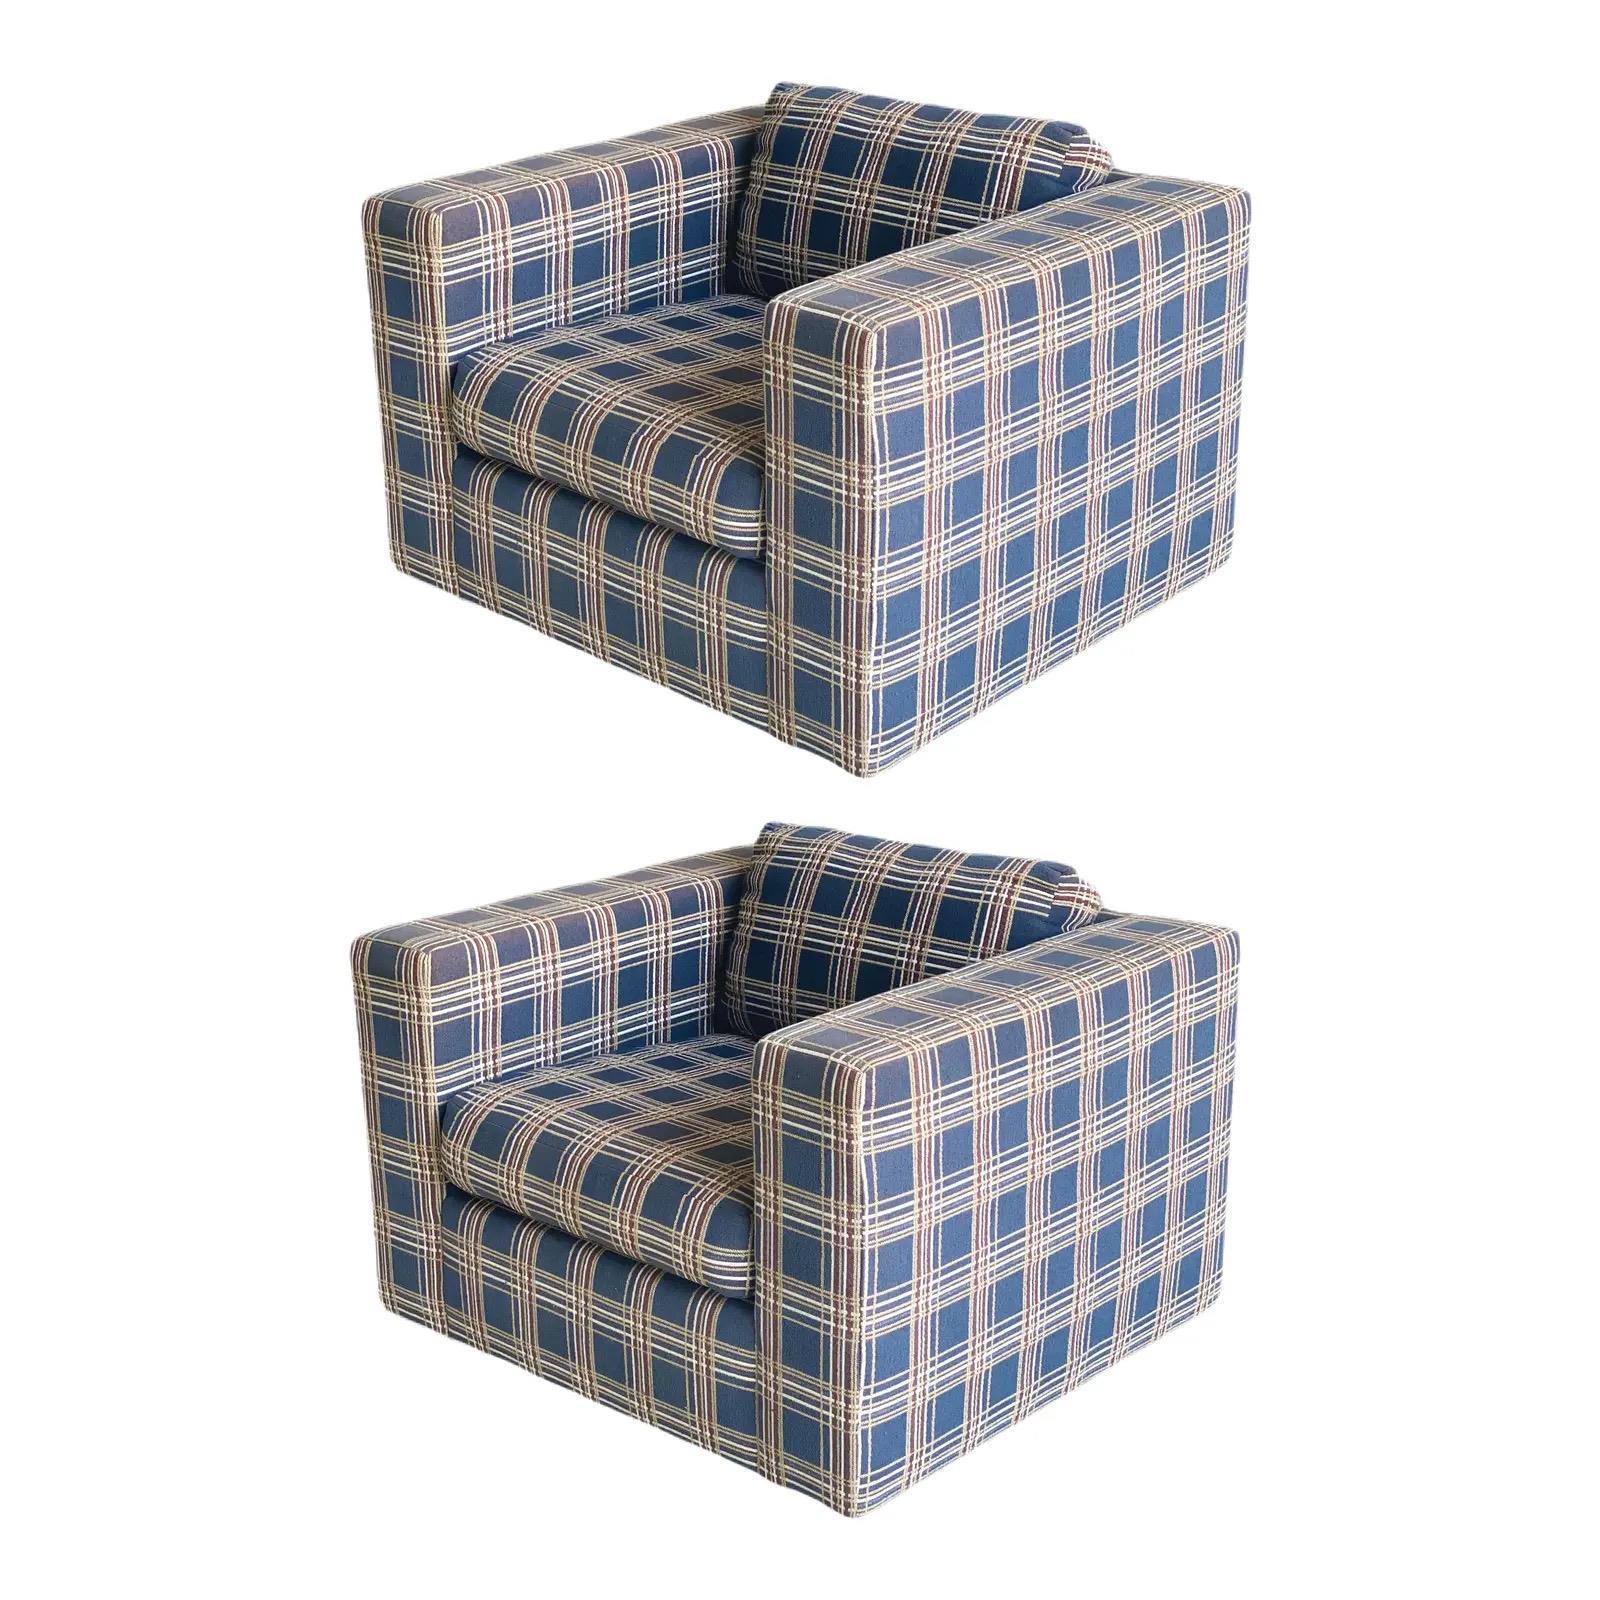 1970s Milo Baughman for Thayer Coggin Cube Lounge Chairs, a Pair